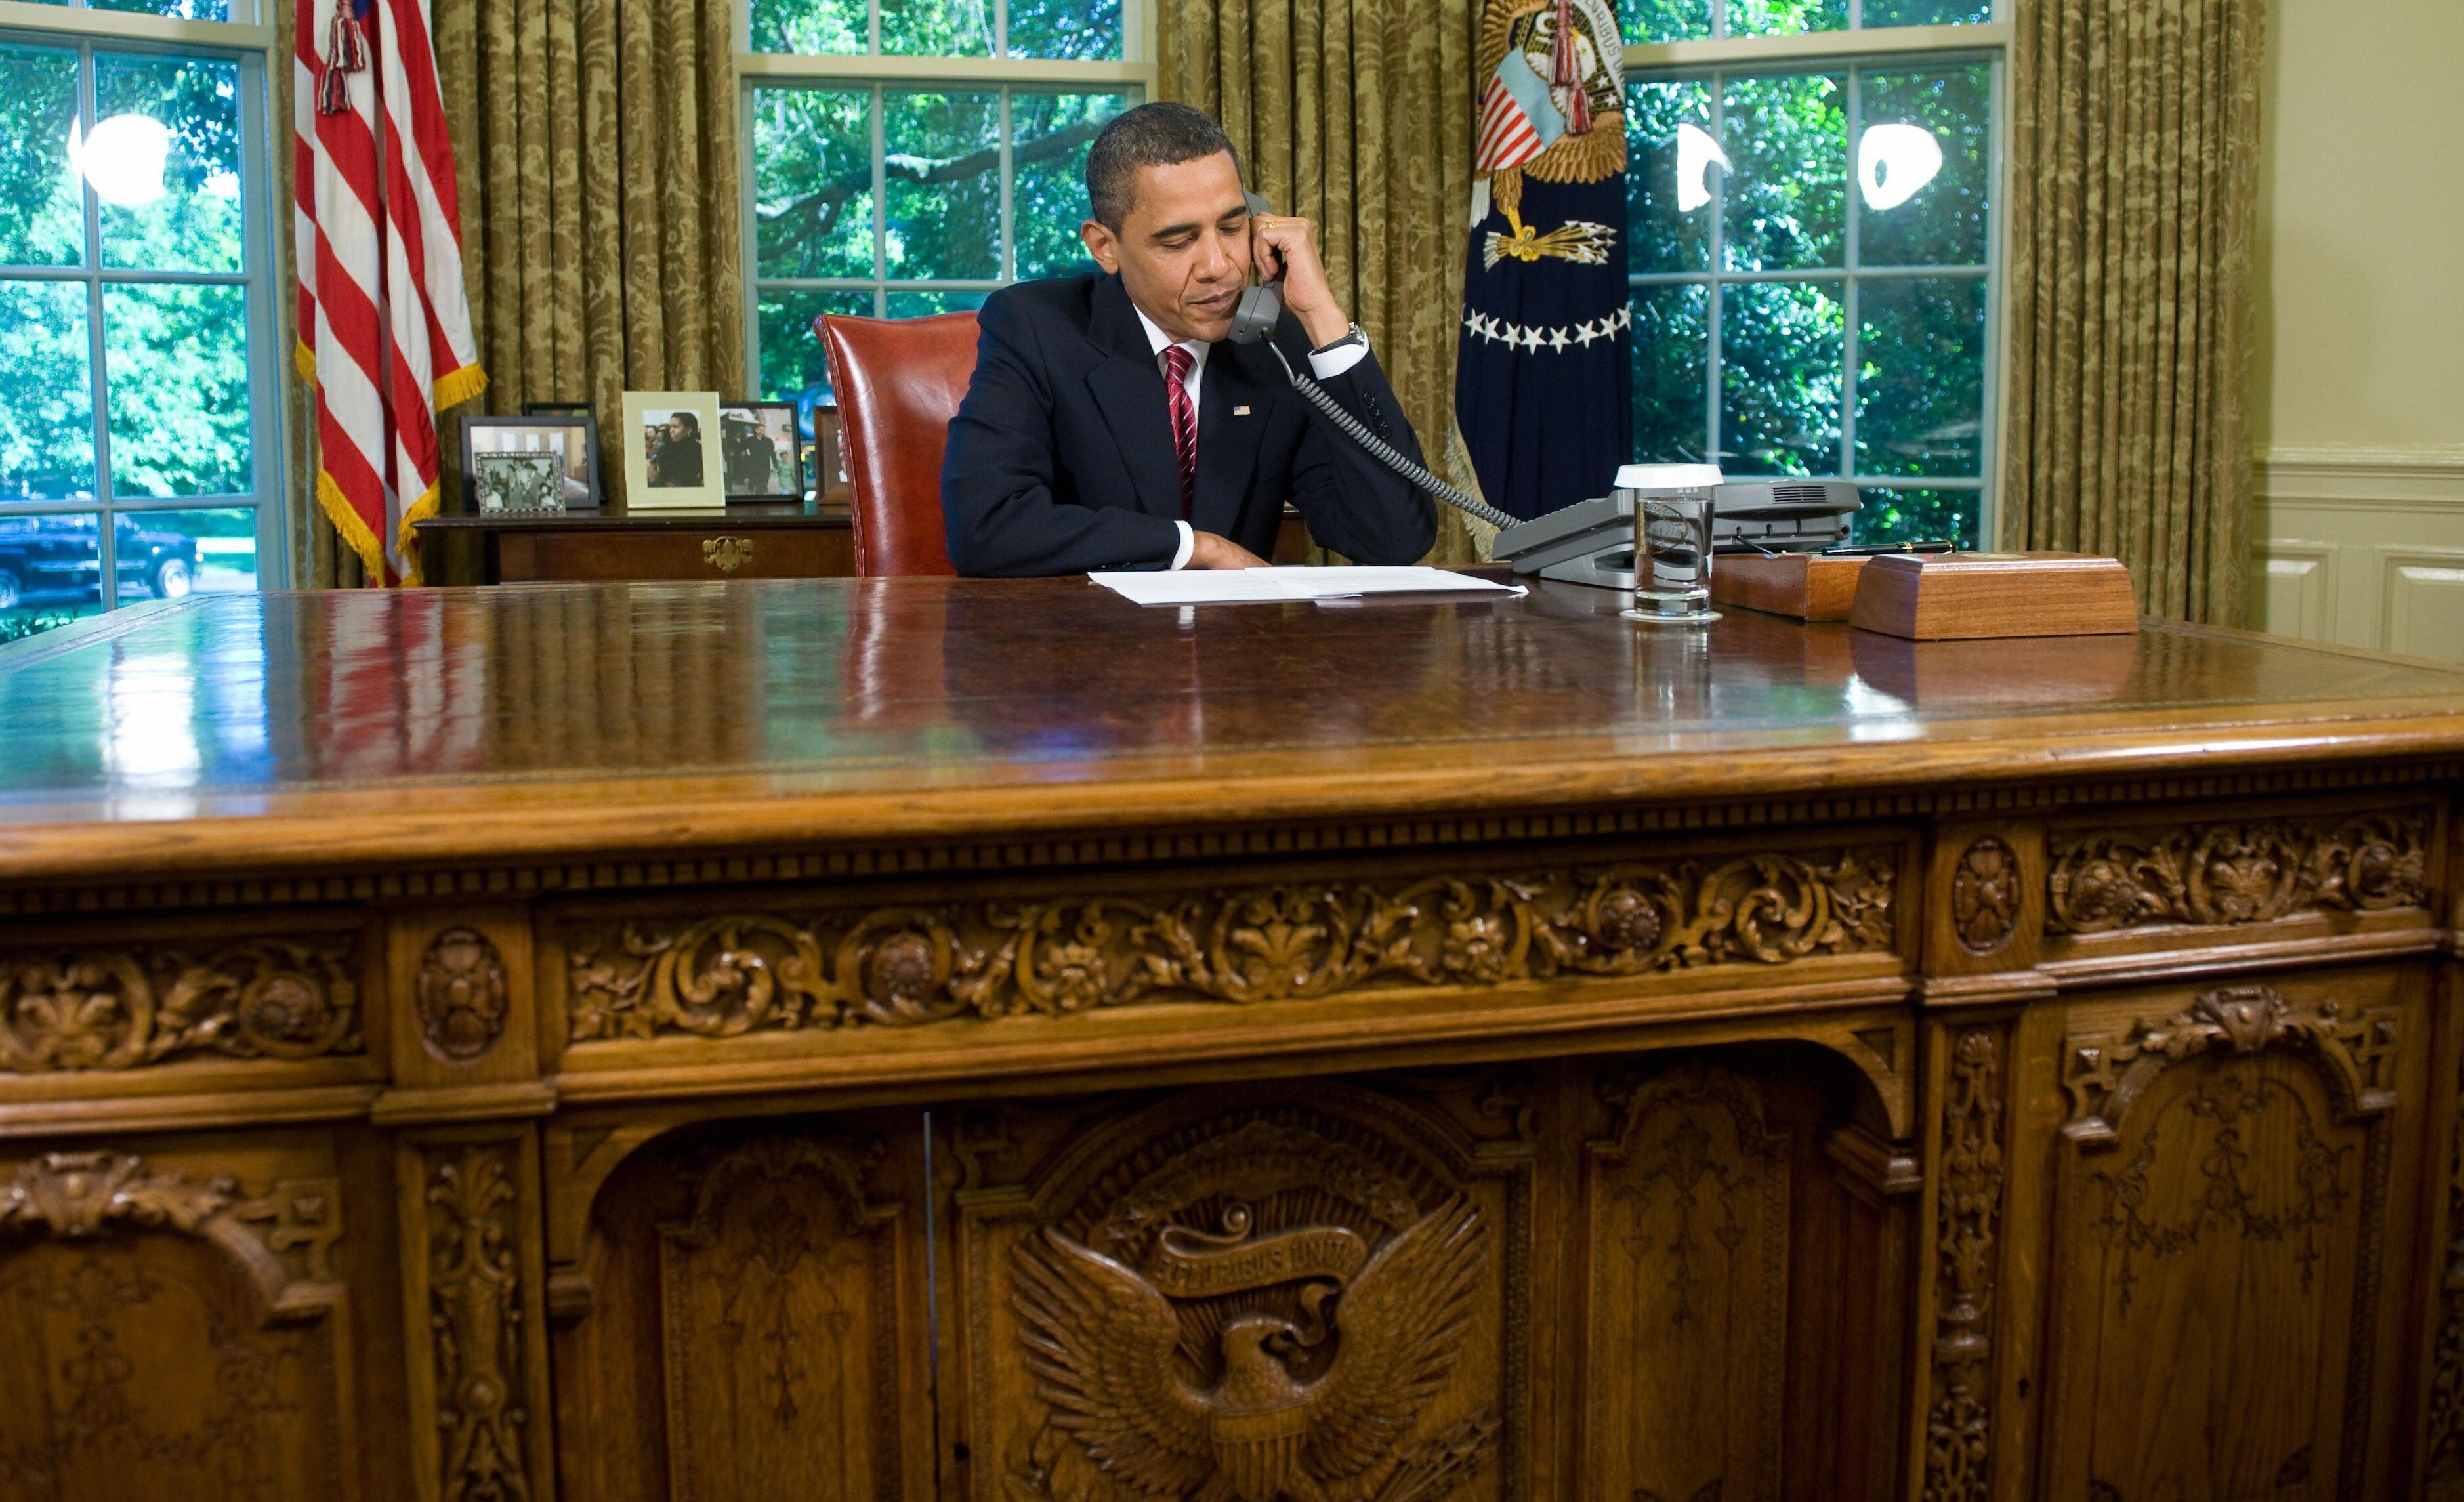 oval office resolute desk. Oval Office Resolute Desk L